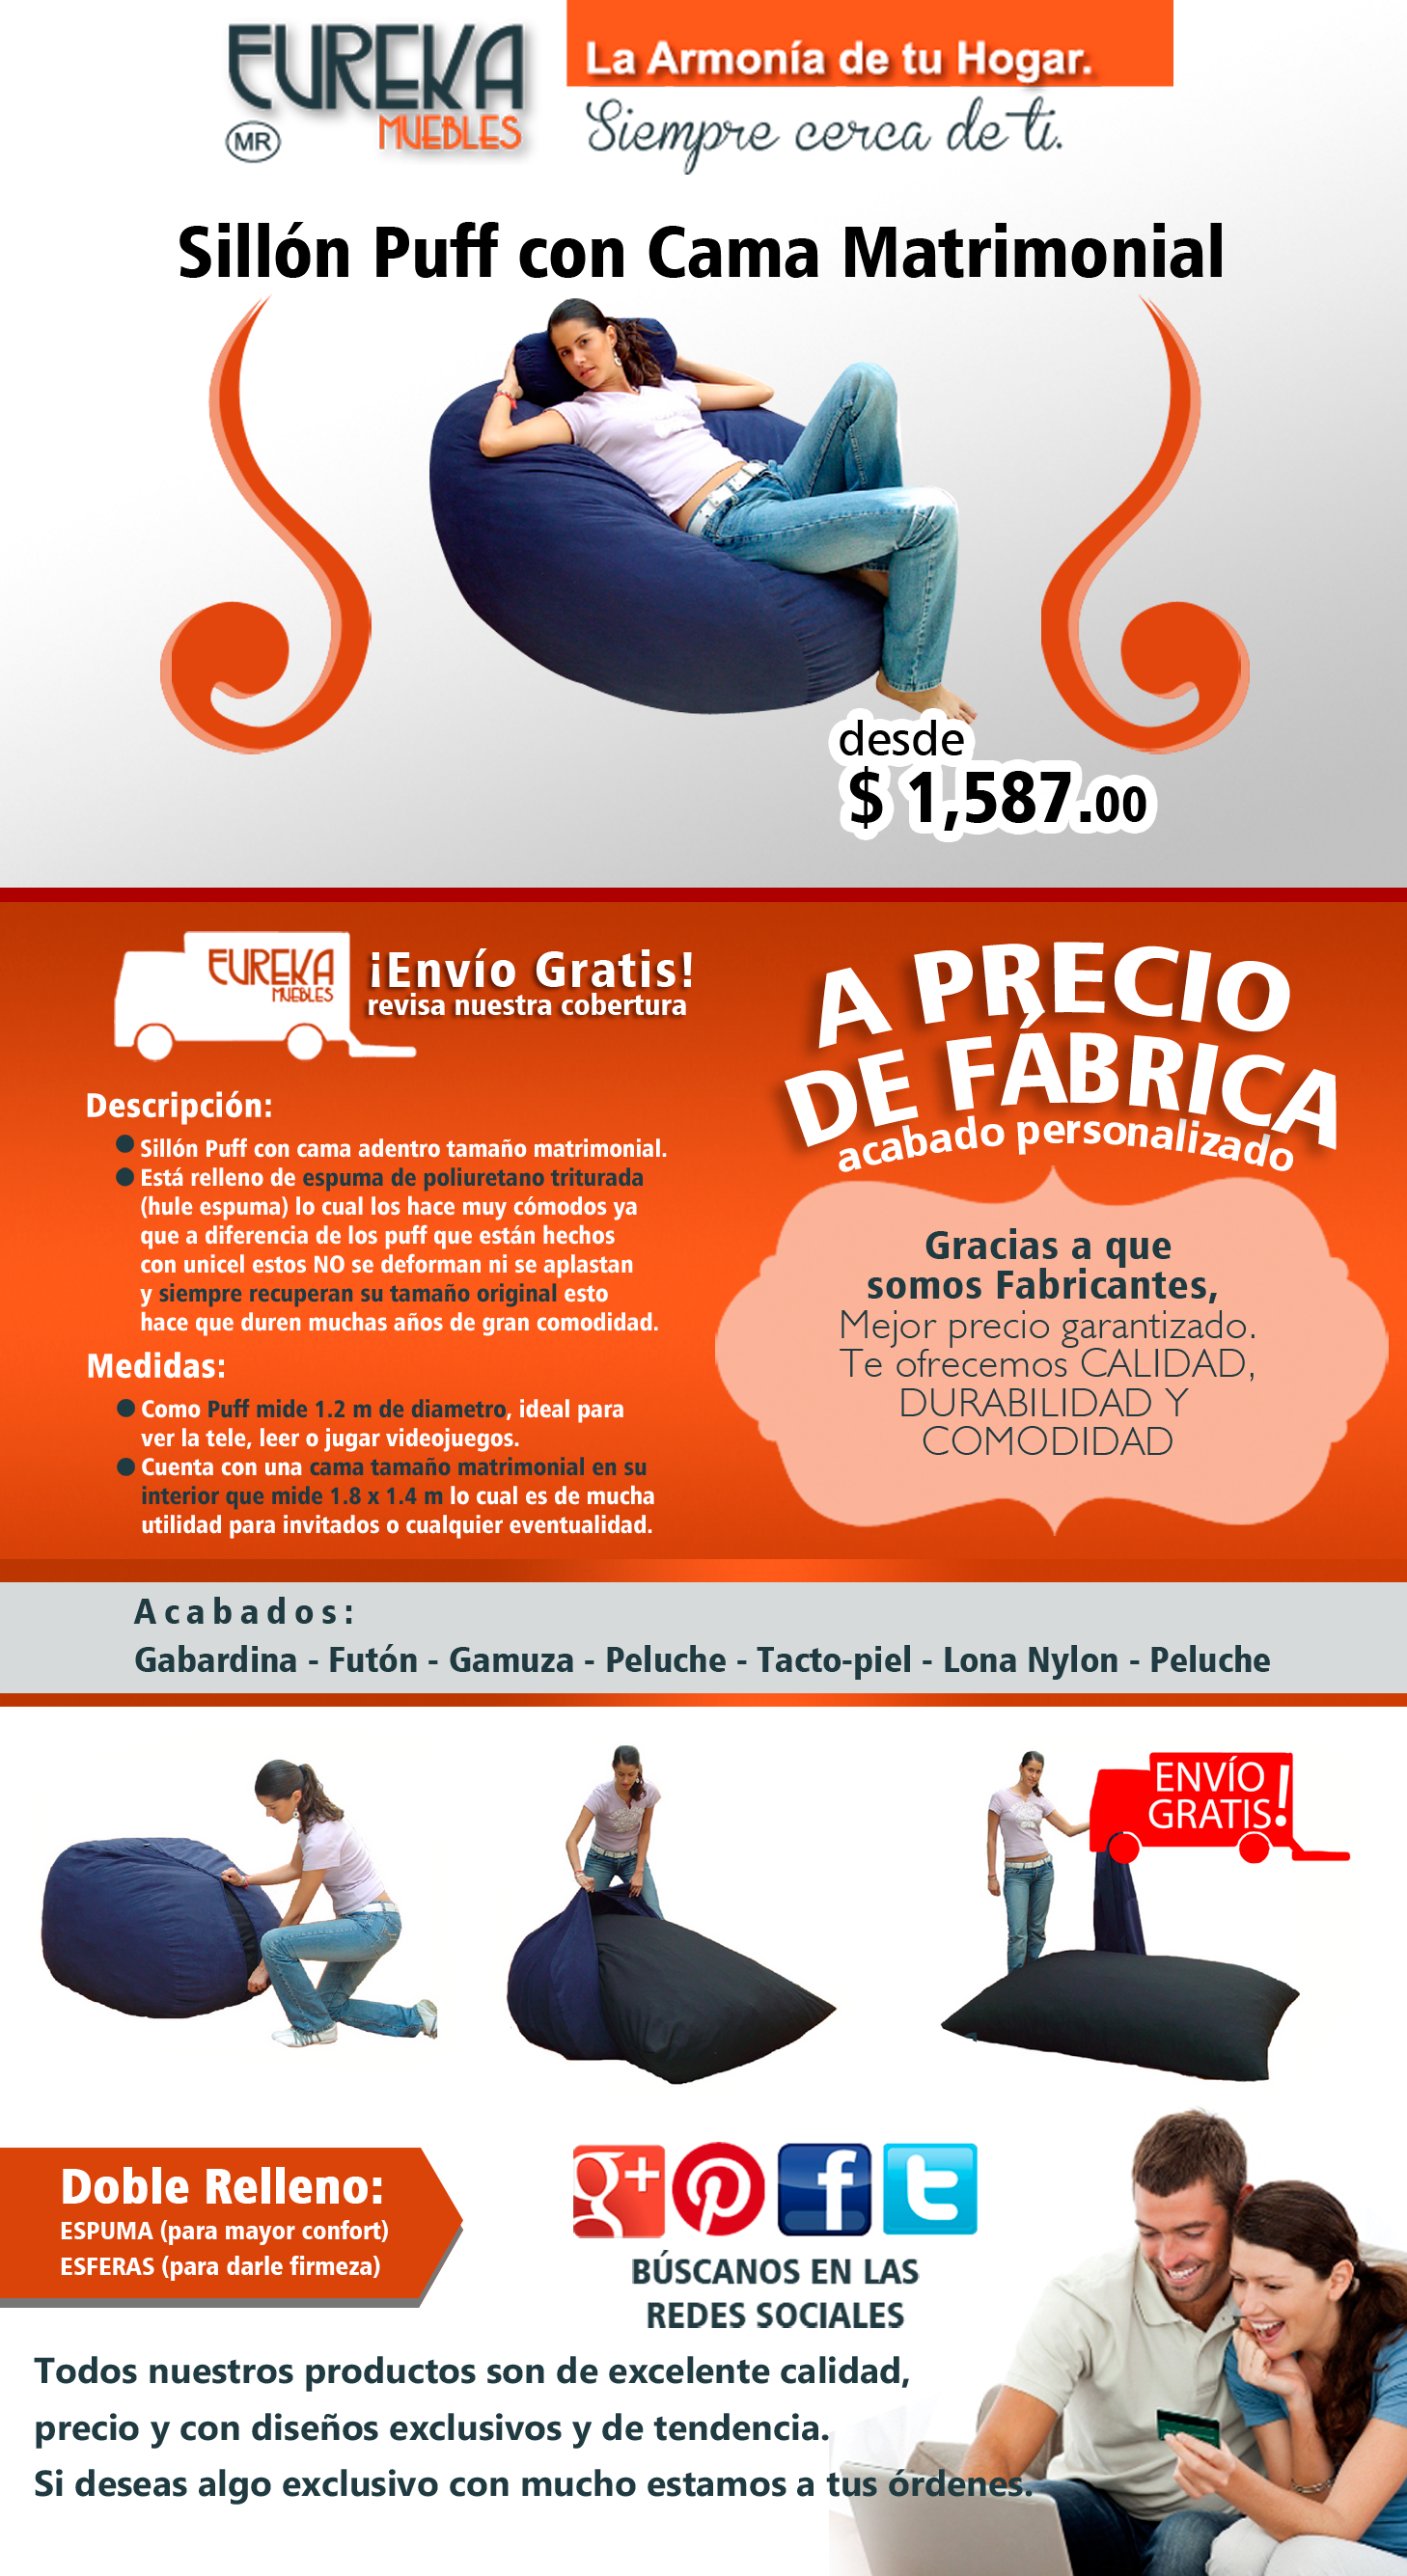 //www.eurekamuebles.com.mx/sofa-camas/puffs/sillon-puff-con ... on sofa designs, sofa blanco, sofa wood, sofa covers, sofa couches, sofa beds, sofa chair, sofa de dois foto, sofa in-house, sofa styles, sofa legs, sofa car, sofa mart, sofa love, sofa china, sofa azul,